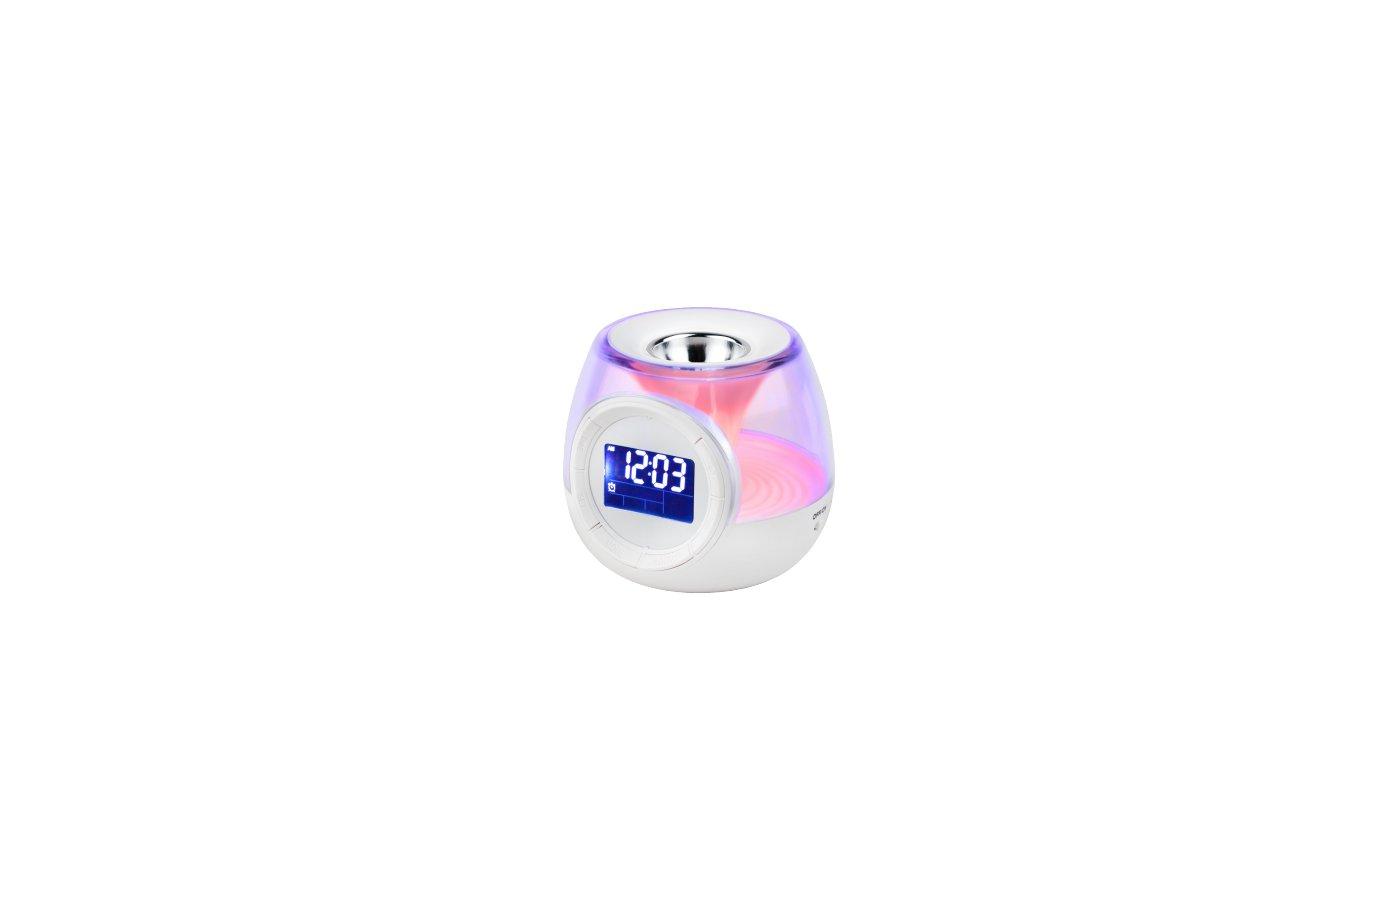 Настольные часы ЭРА 635162 W-UP-E5 Часы - светильник